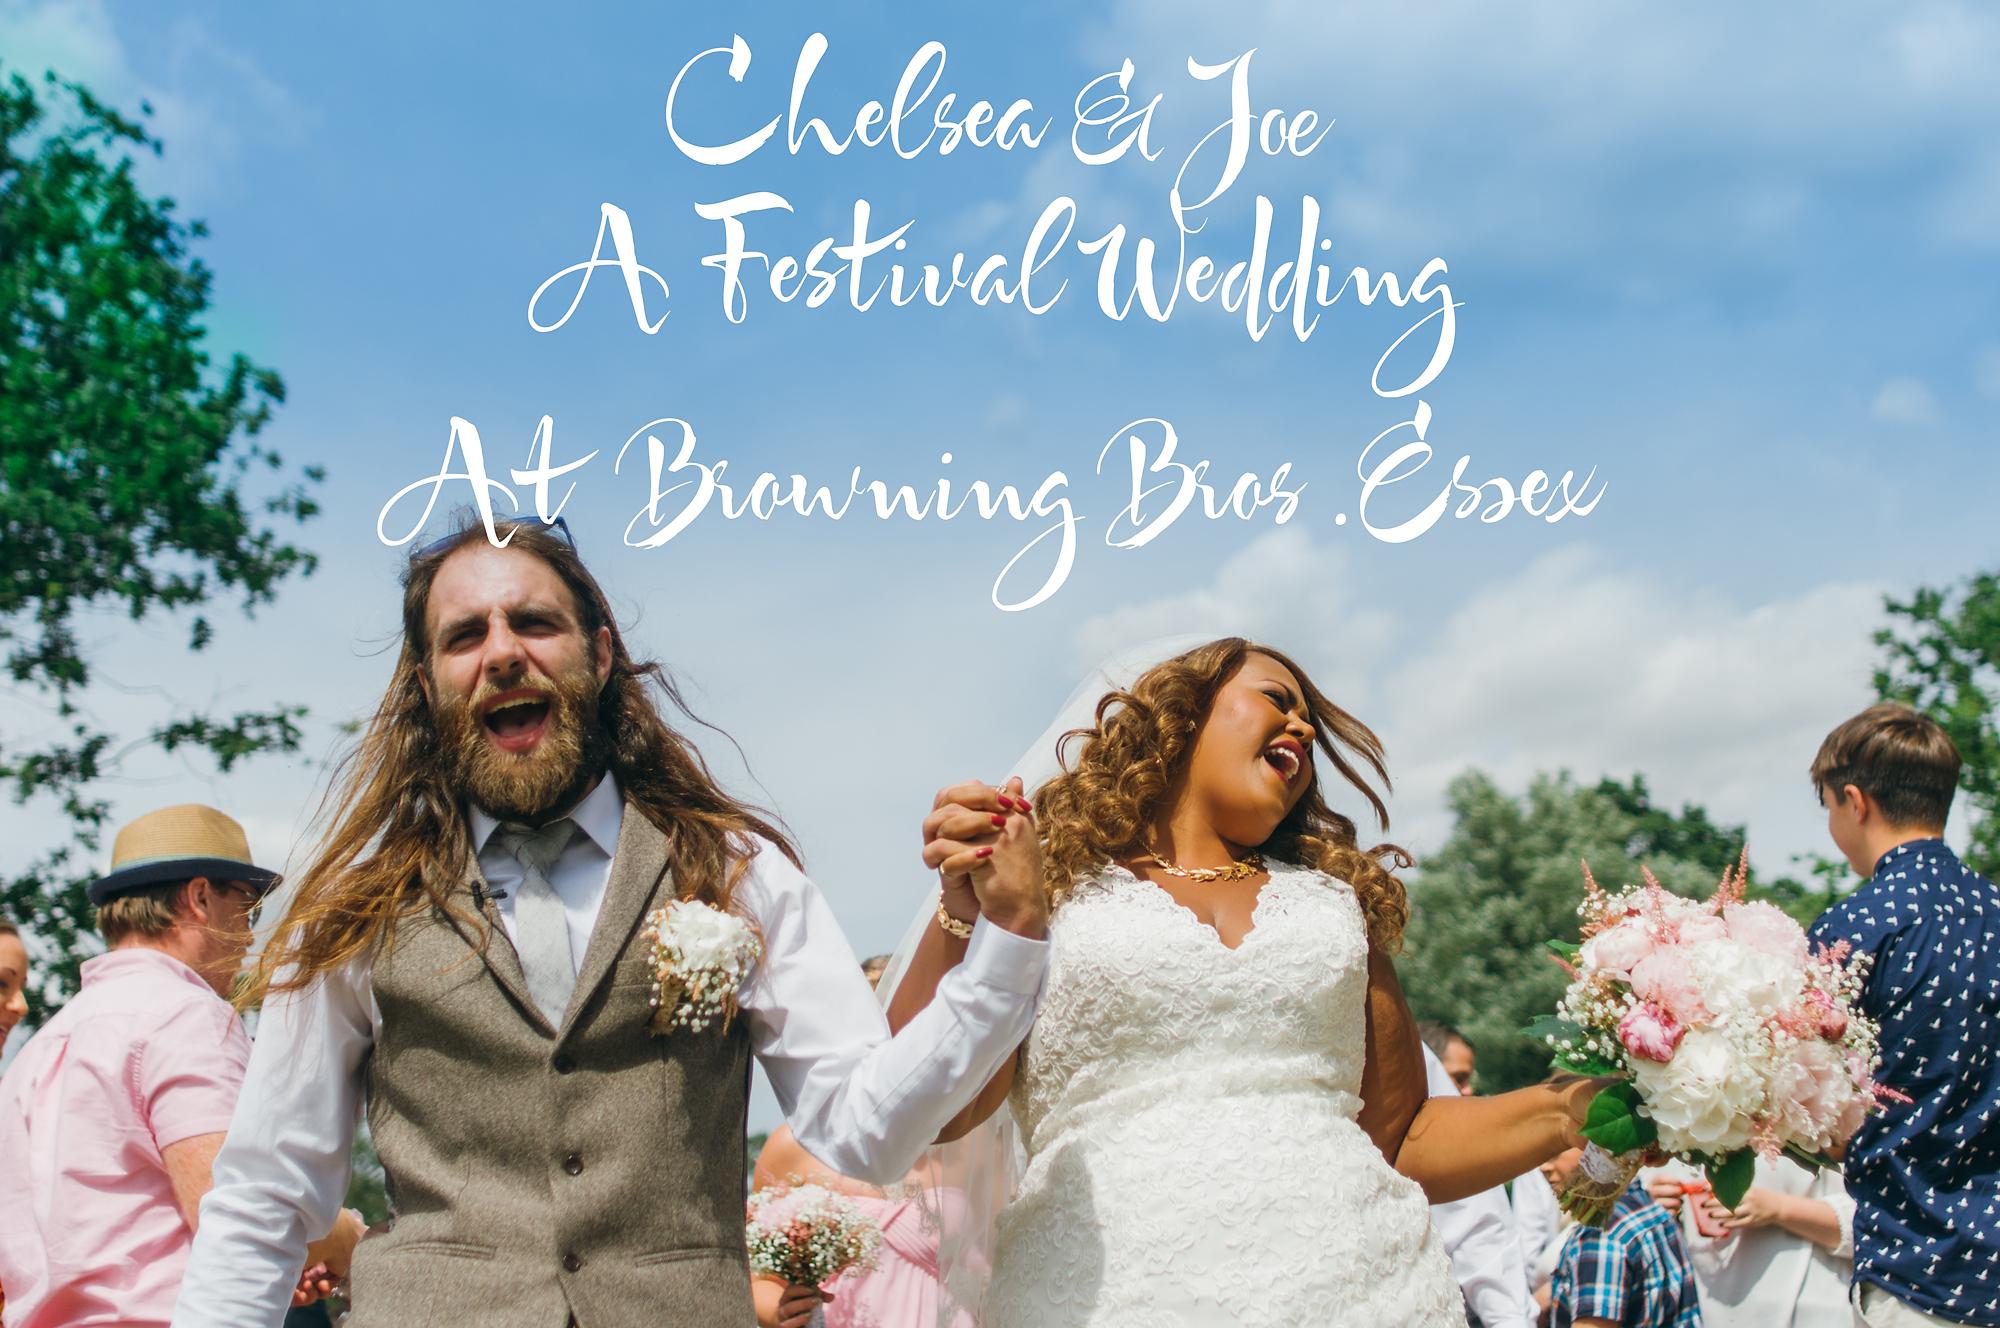 Festival Wedding at Browning Bros. Essex+Modern Essex Wedding Photographer